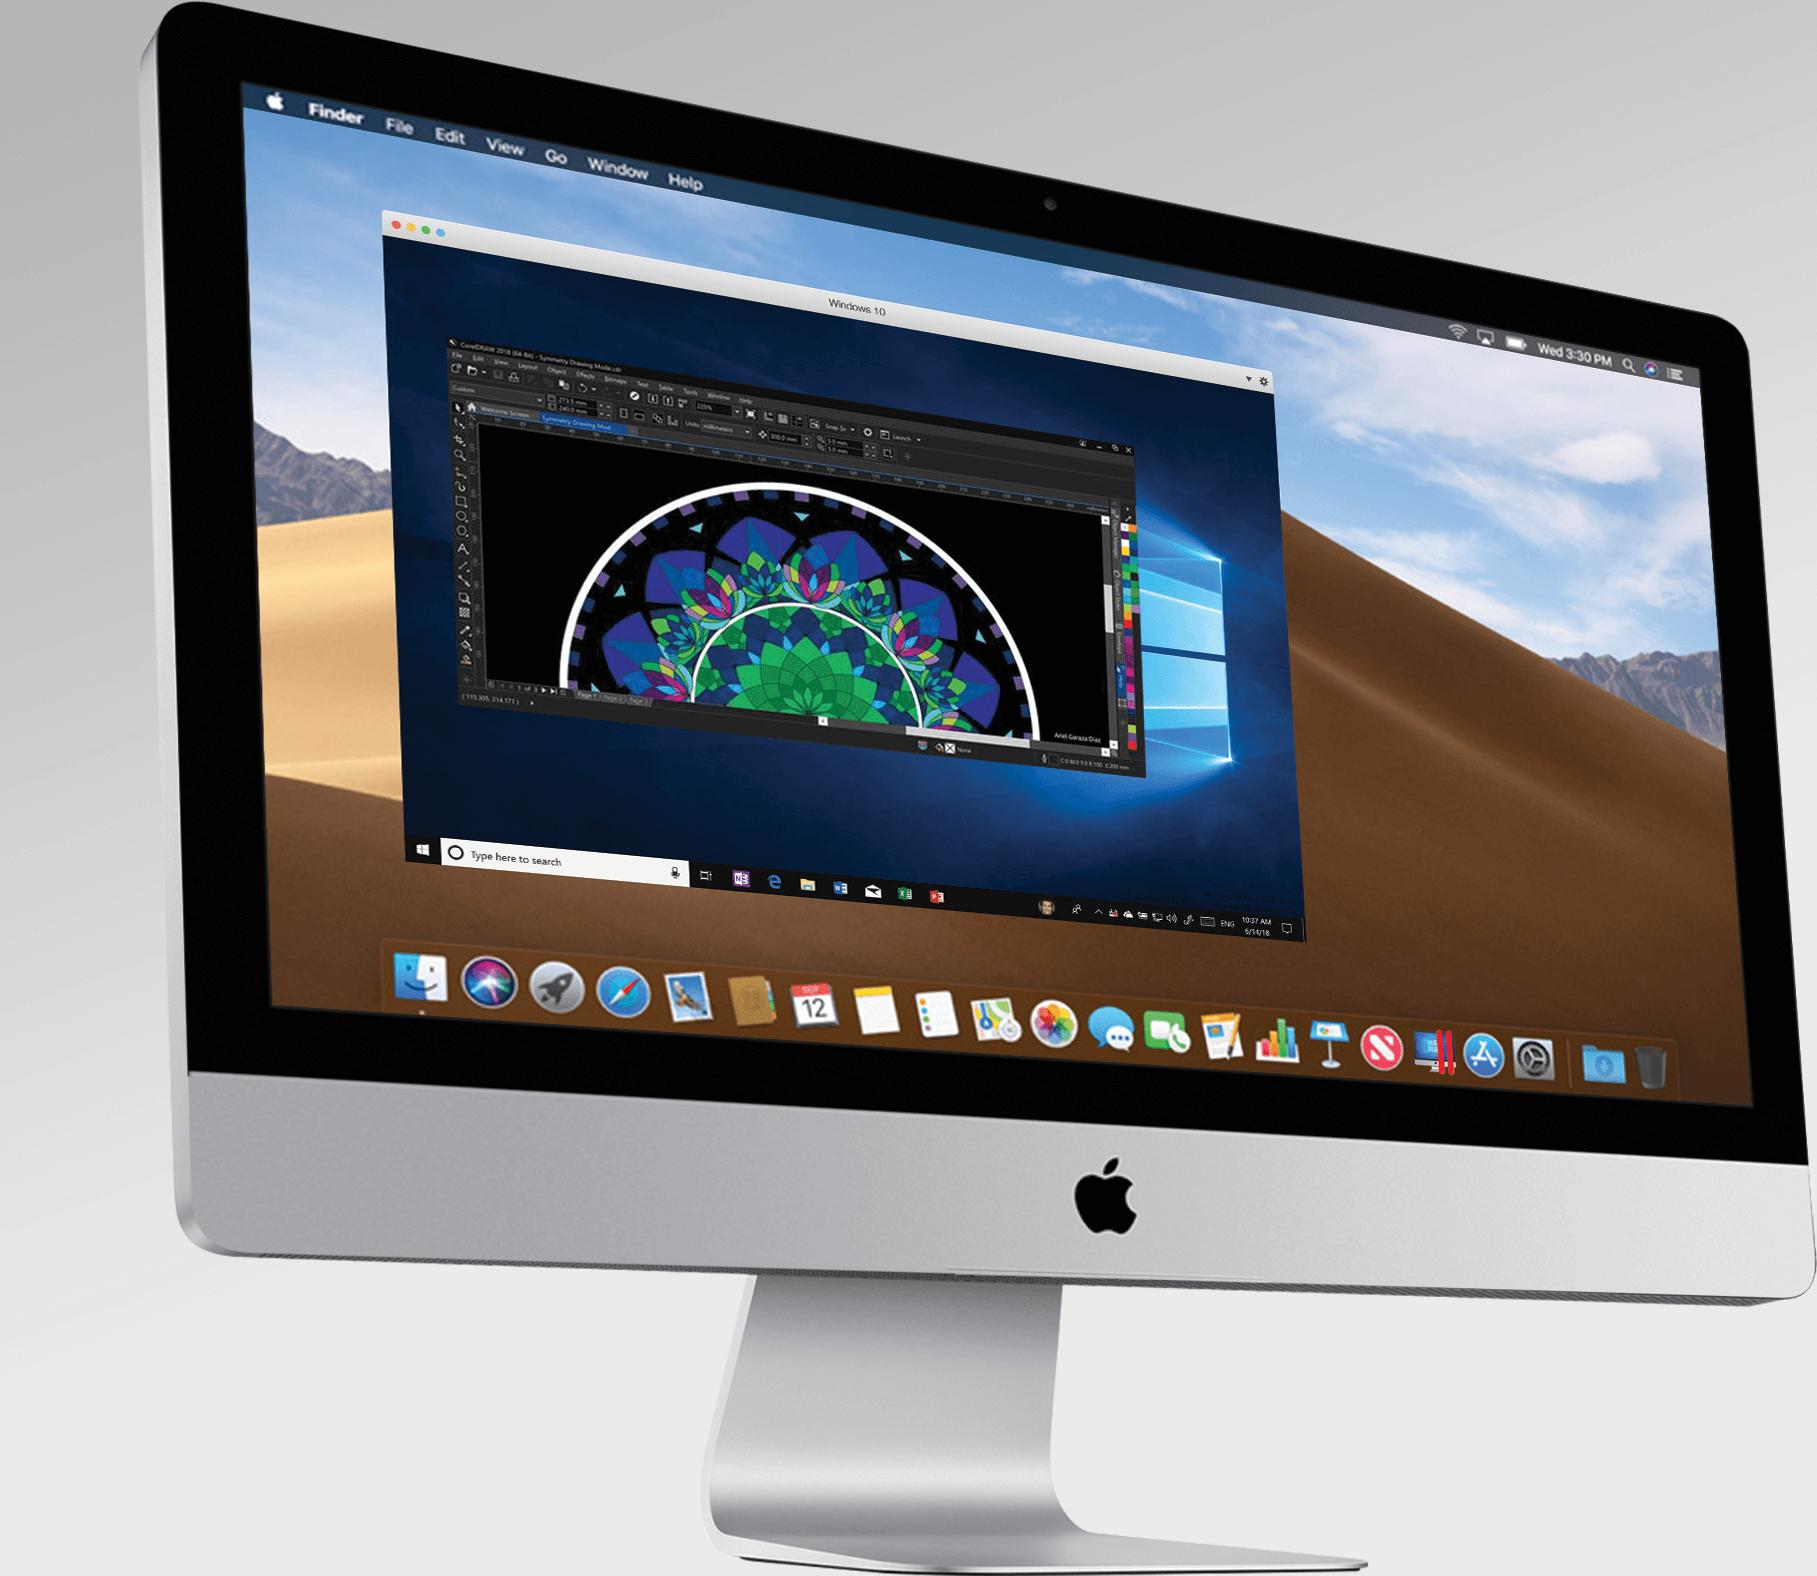 coreldraw free download for macbook air